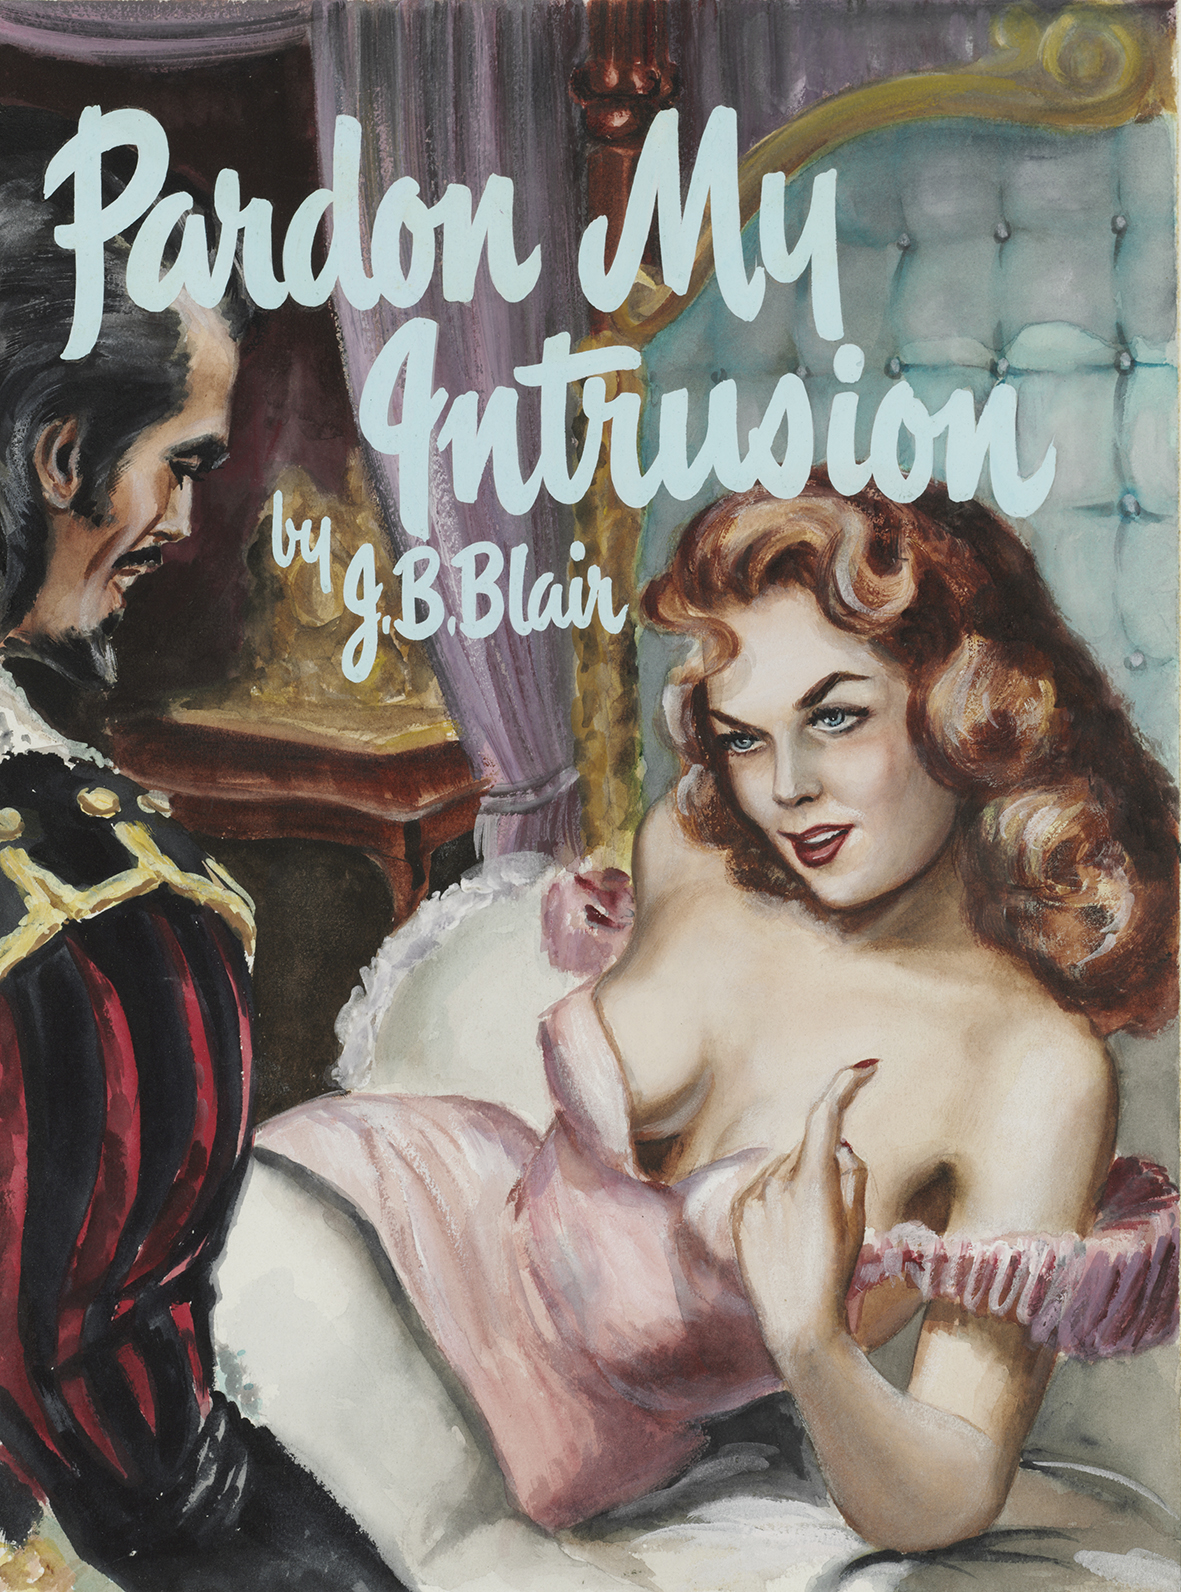 Pardon my intrusion